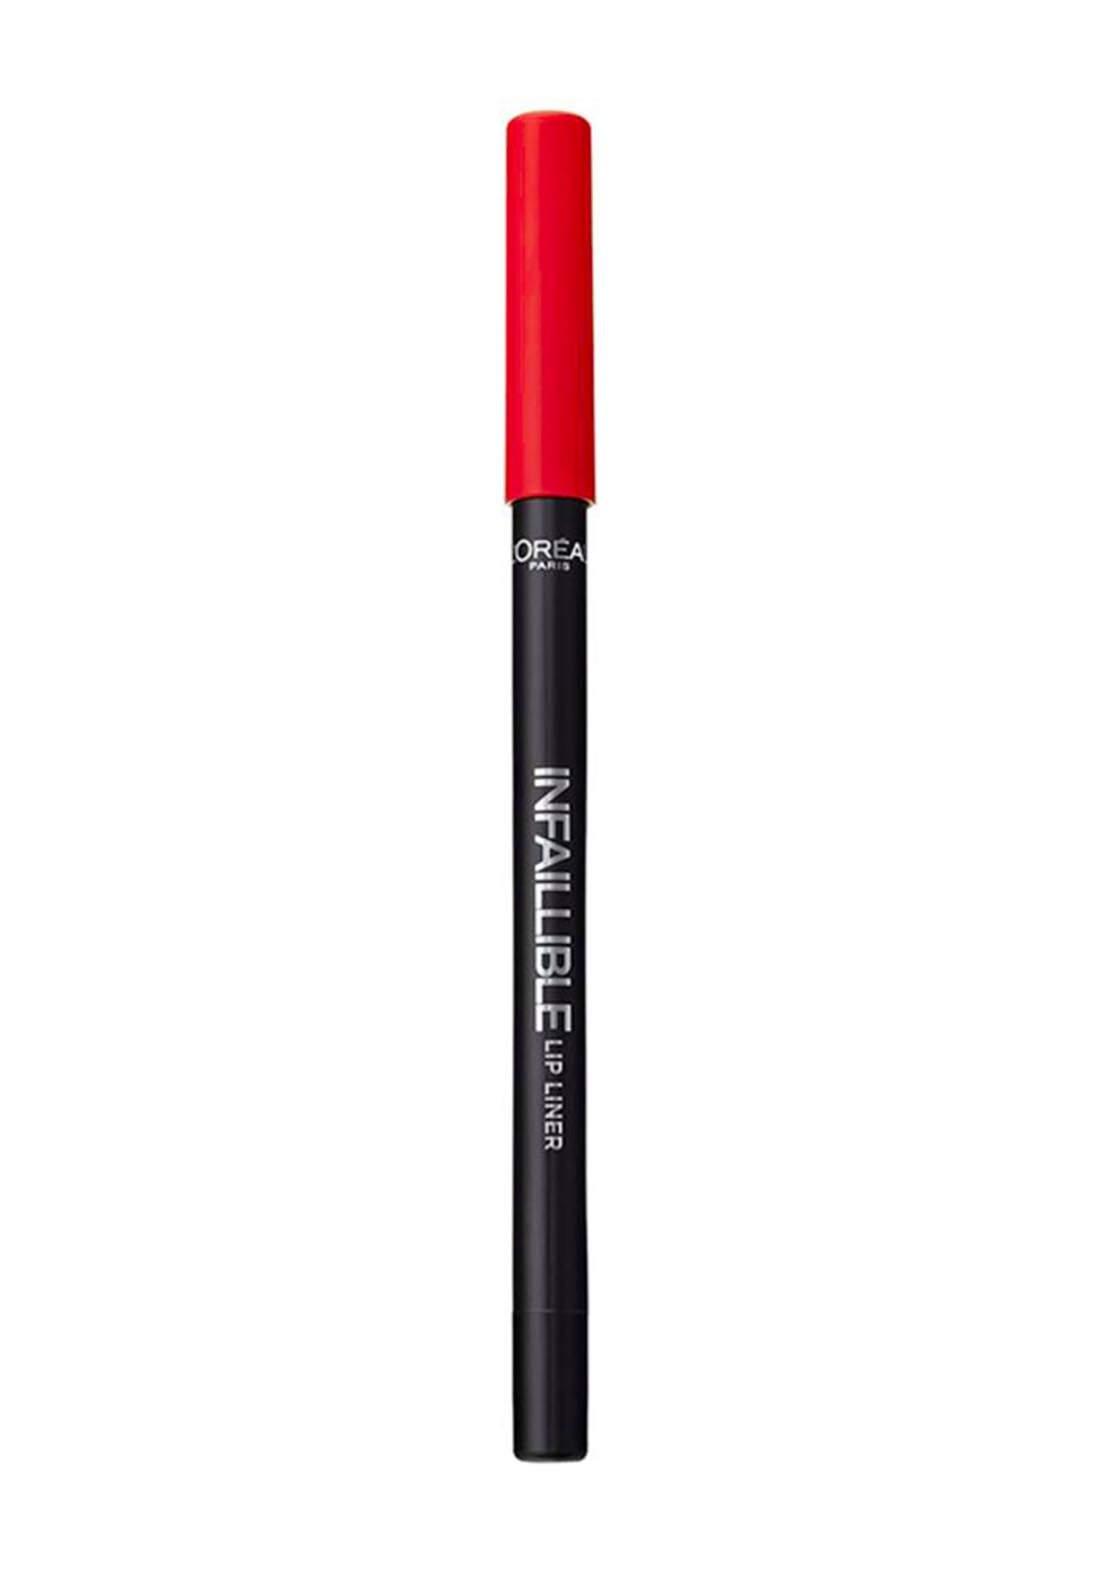 L'Oreal Paris Infallible Lip Liner 711 Invisible Red (027-0981) قلم محدد للشفاه